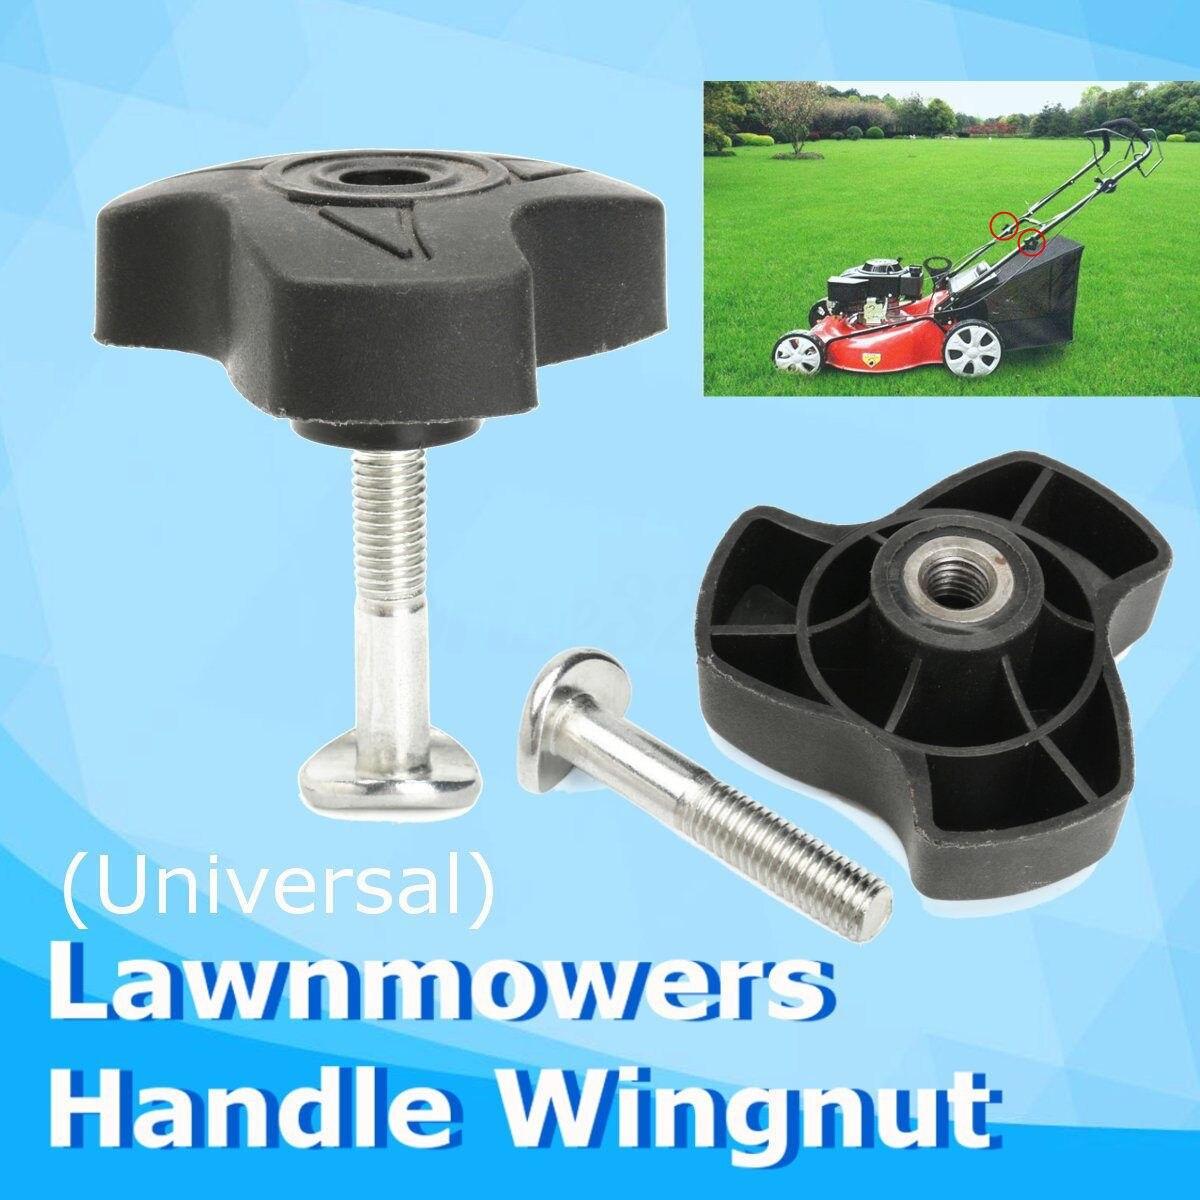 FGHGF 1Pc Universal Lawnmowers Handle Wing Nut font b Power b font Equipment Part Wingnut Lawn